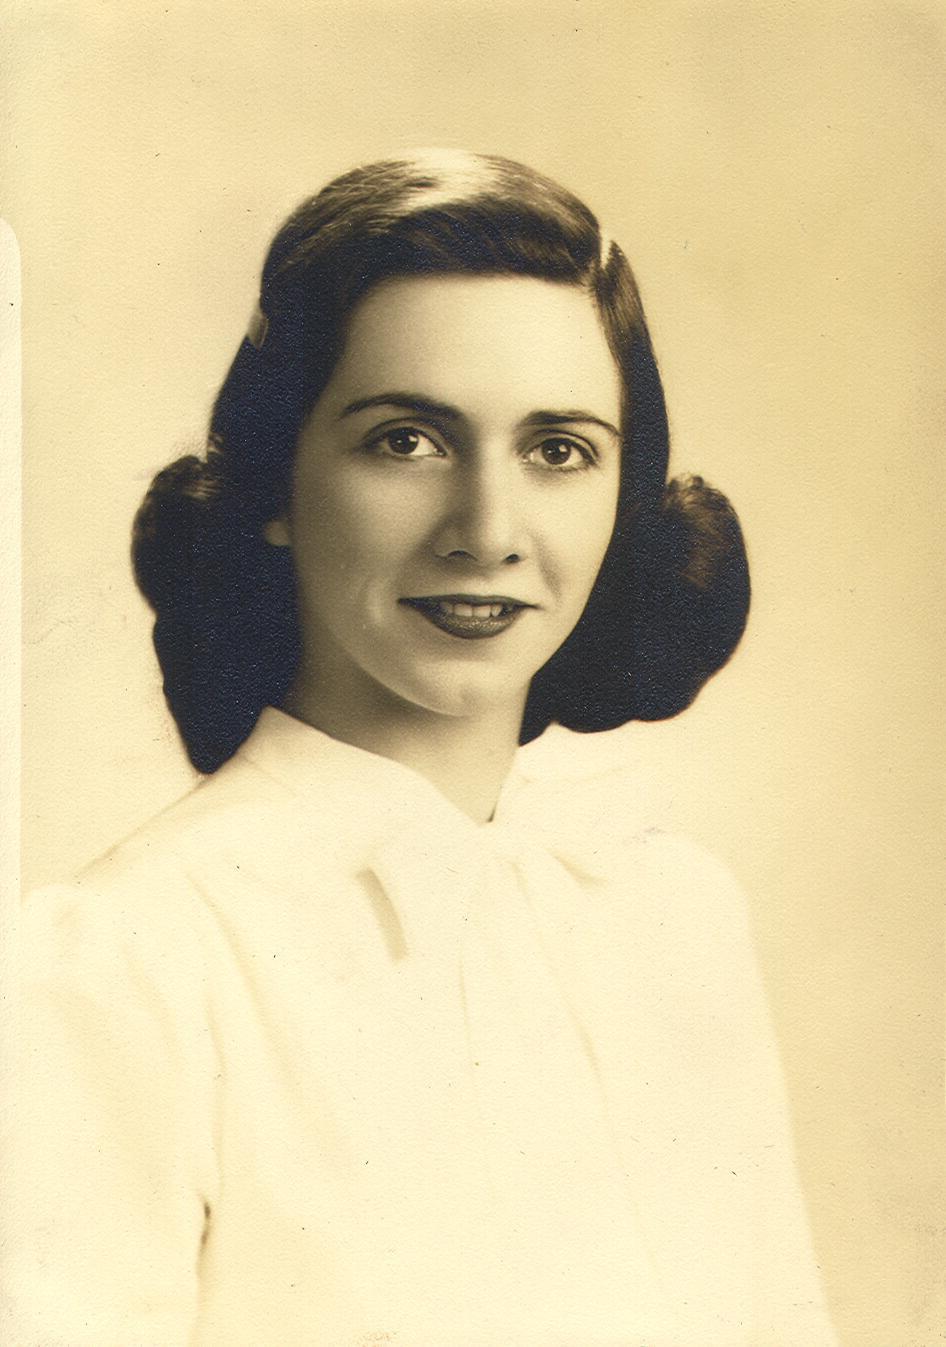 Margaret at age 19